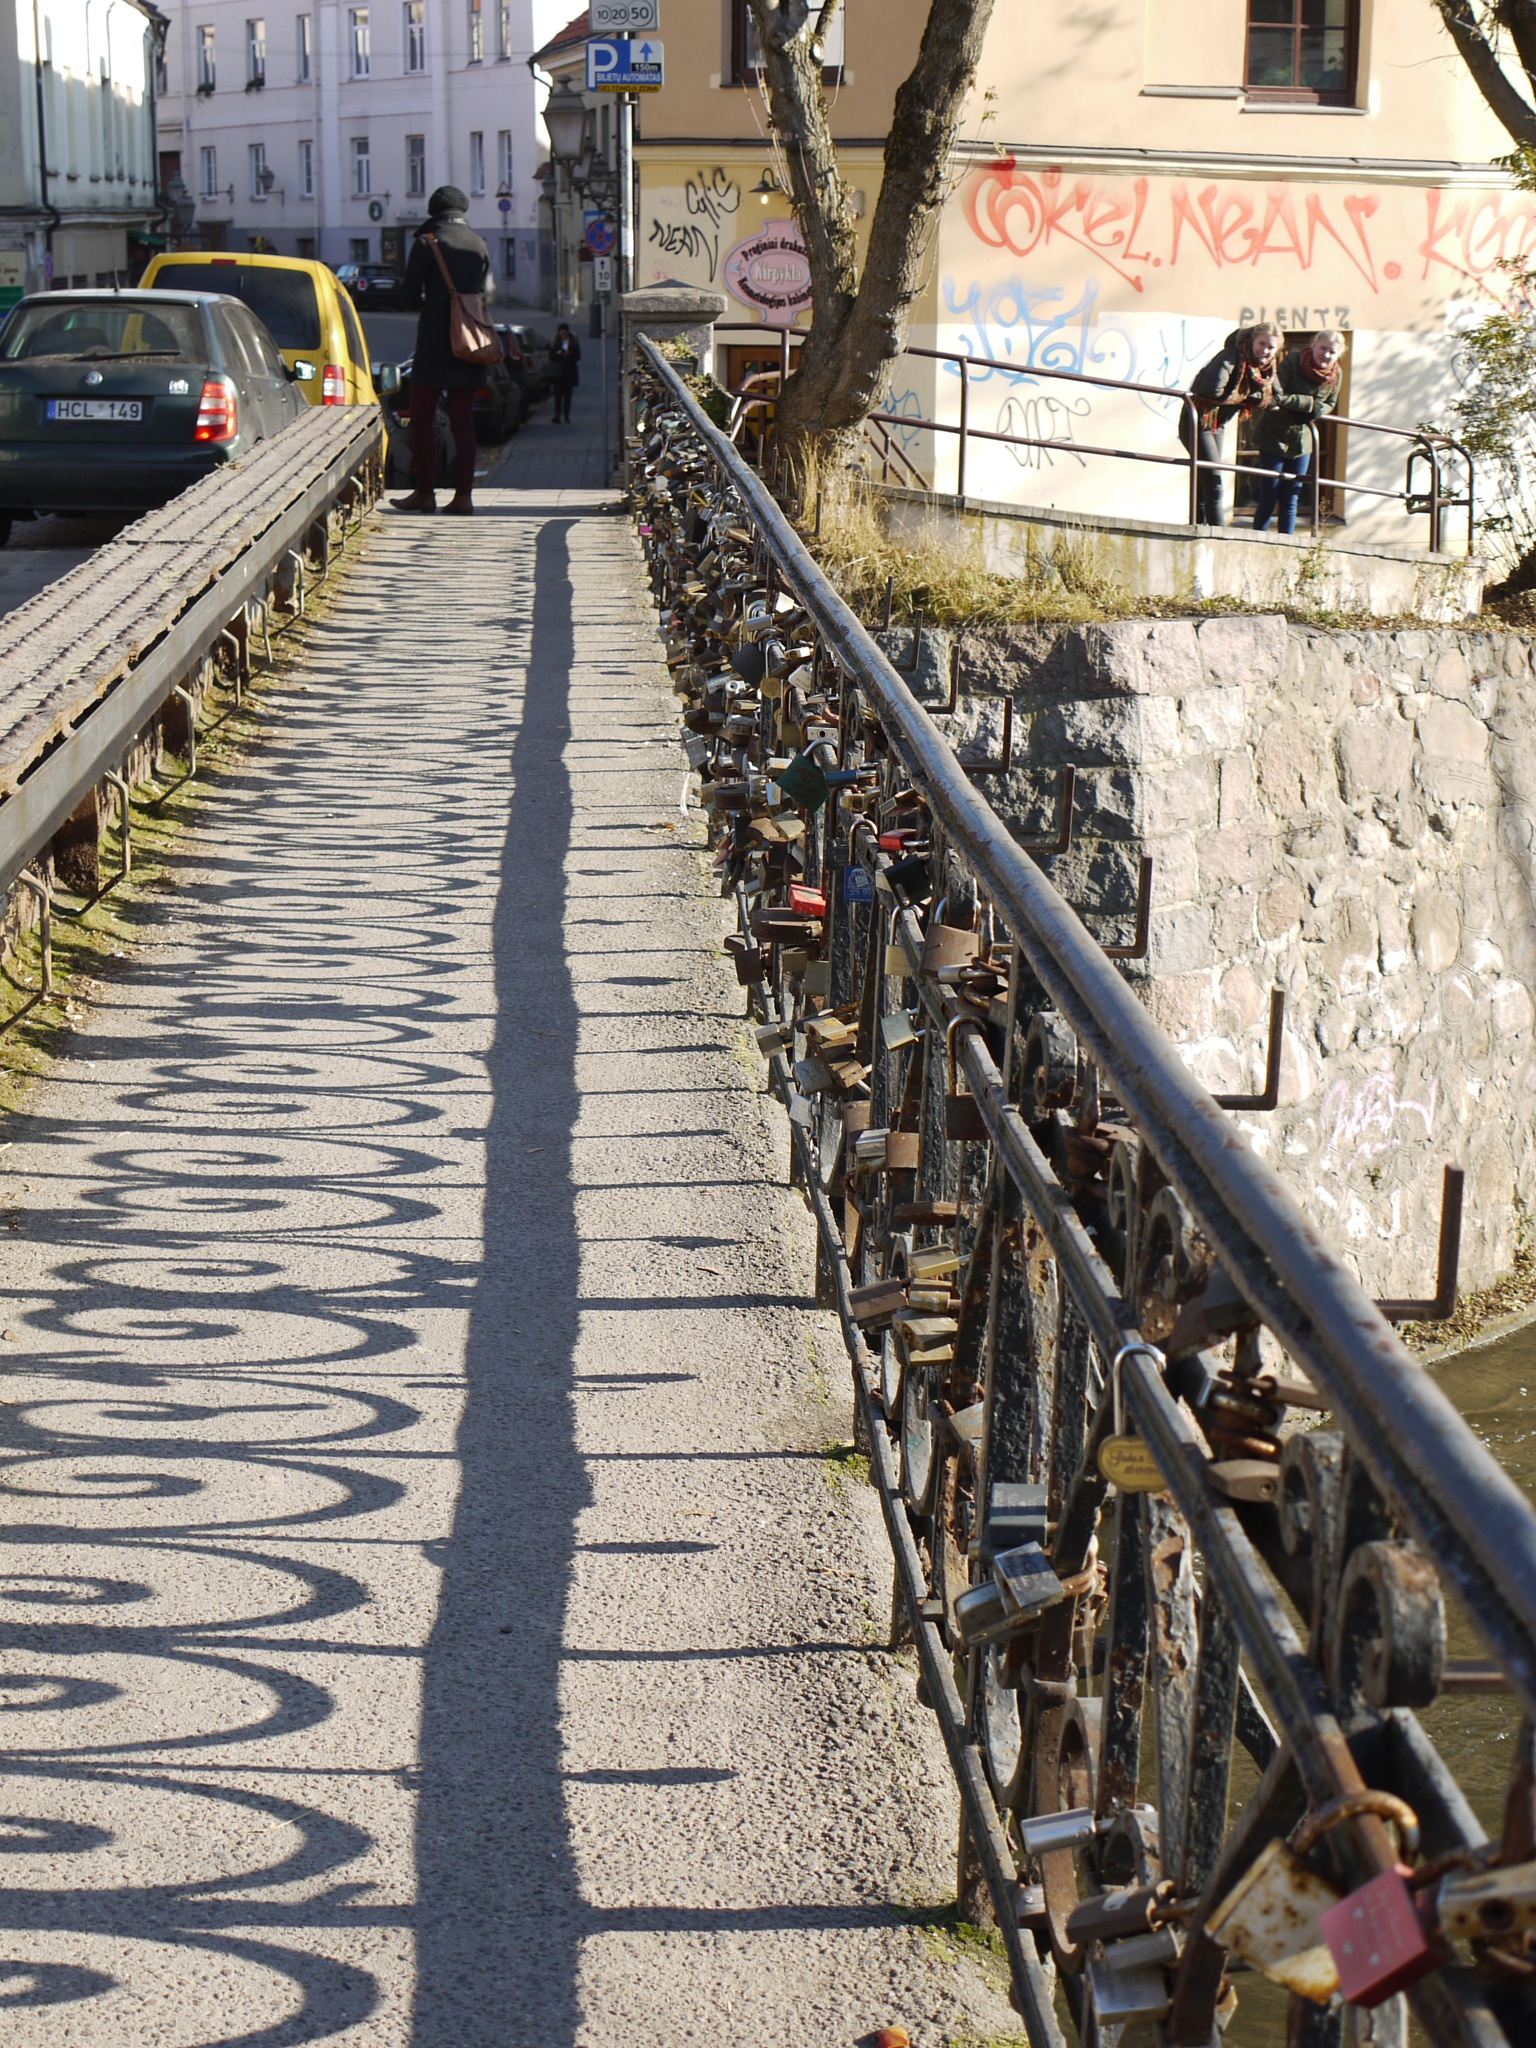 Bridge of Love Locks by dave clarke